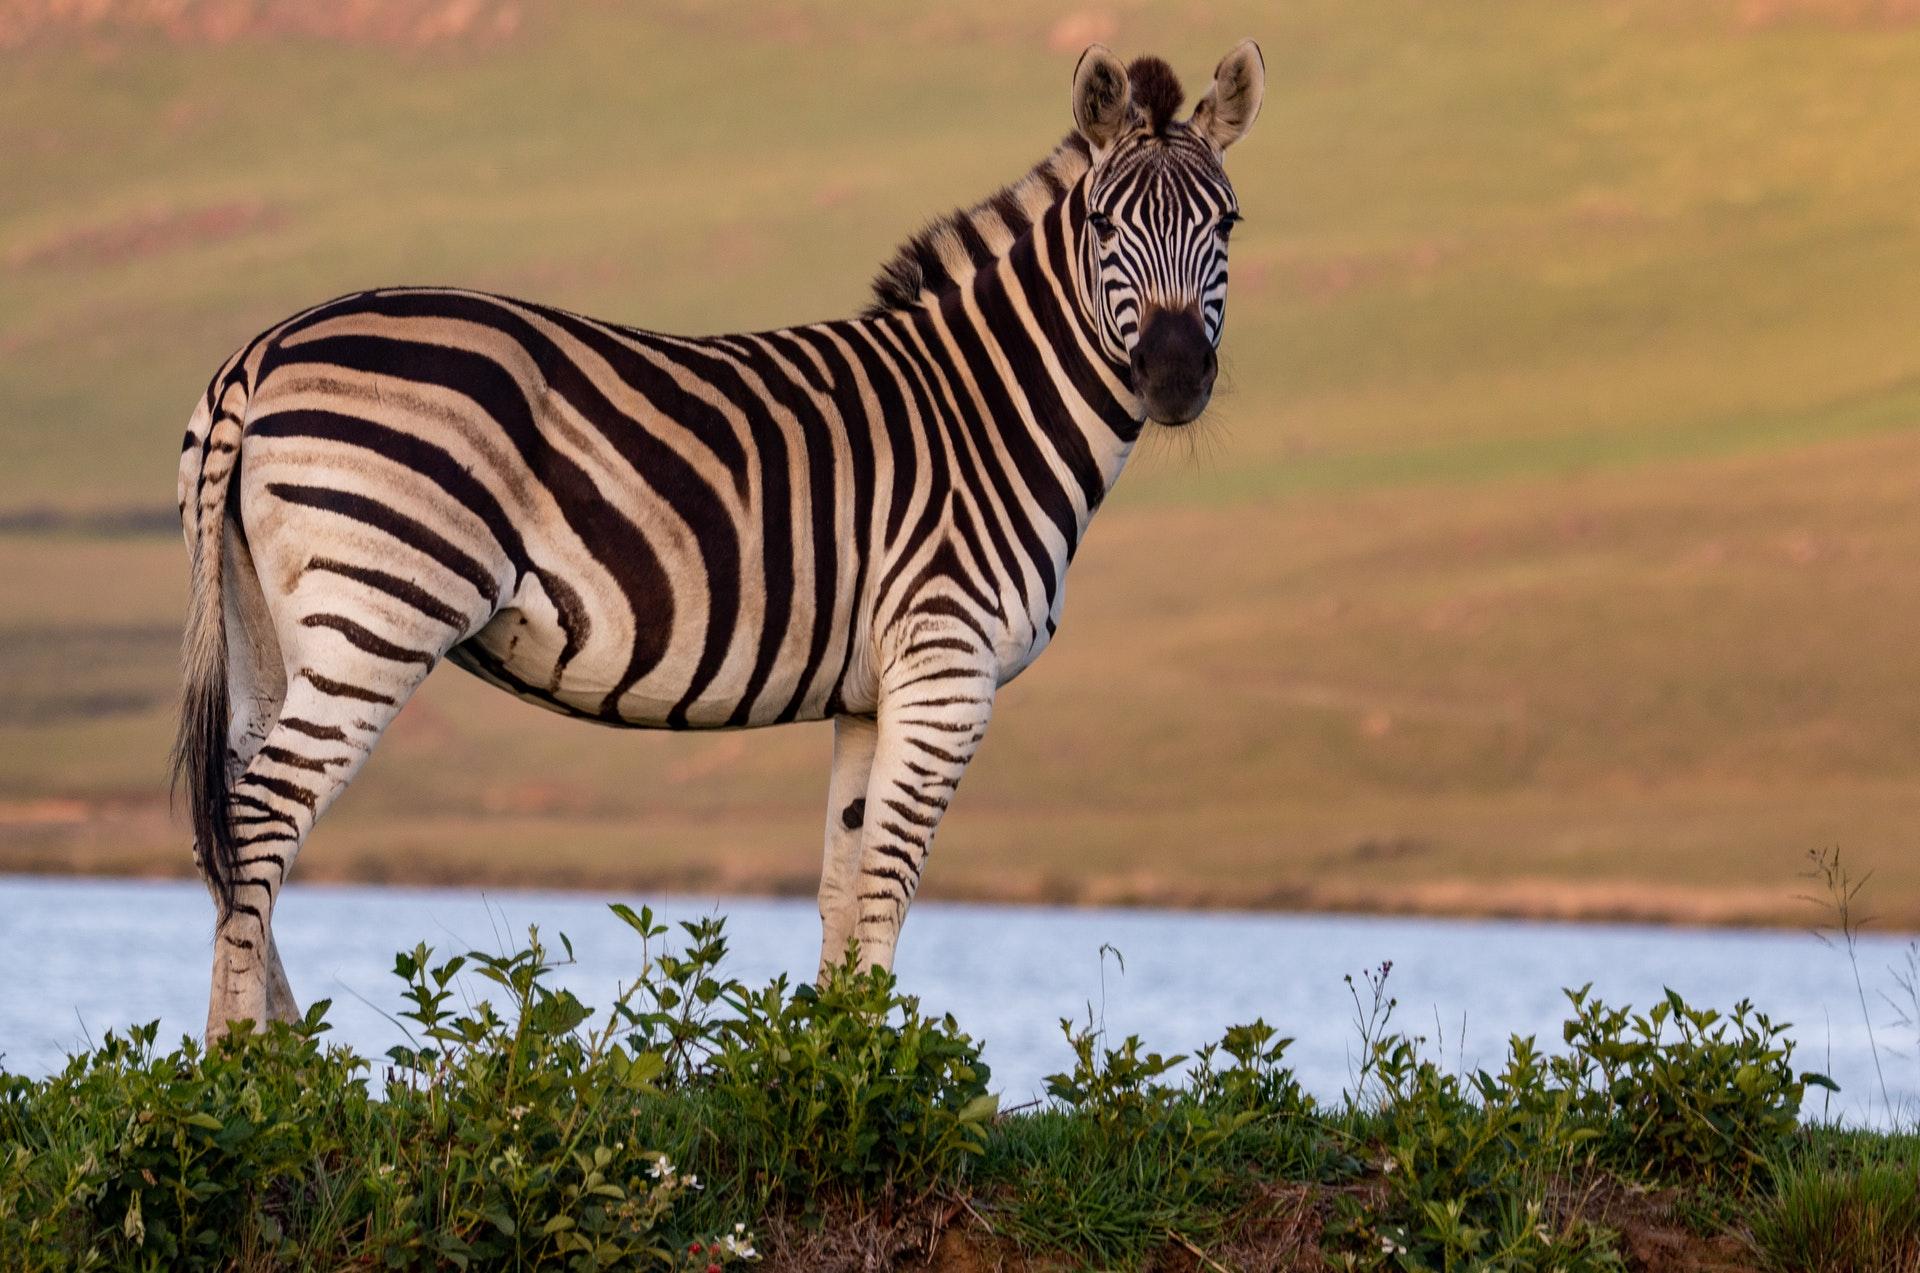 #Budget Tanzania Safari